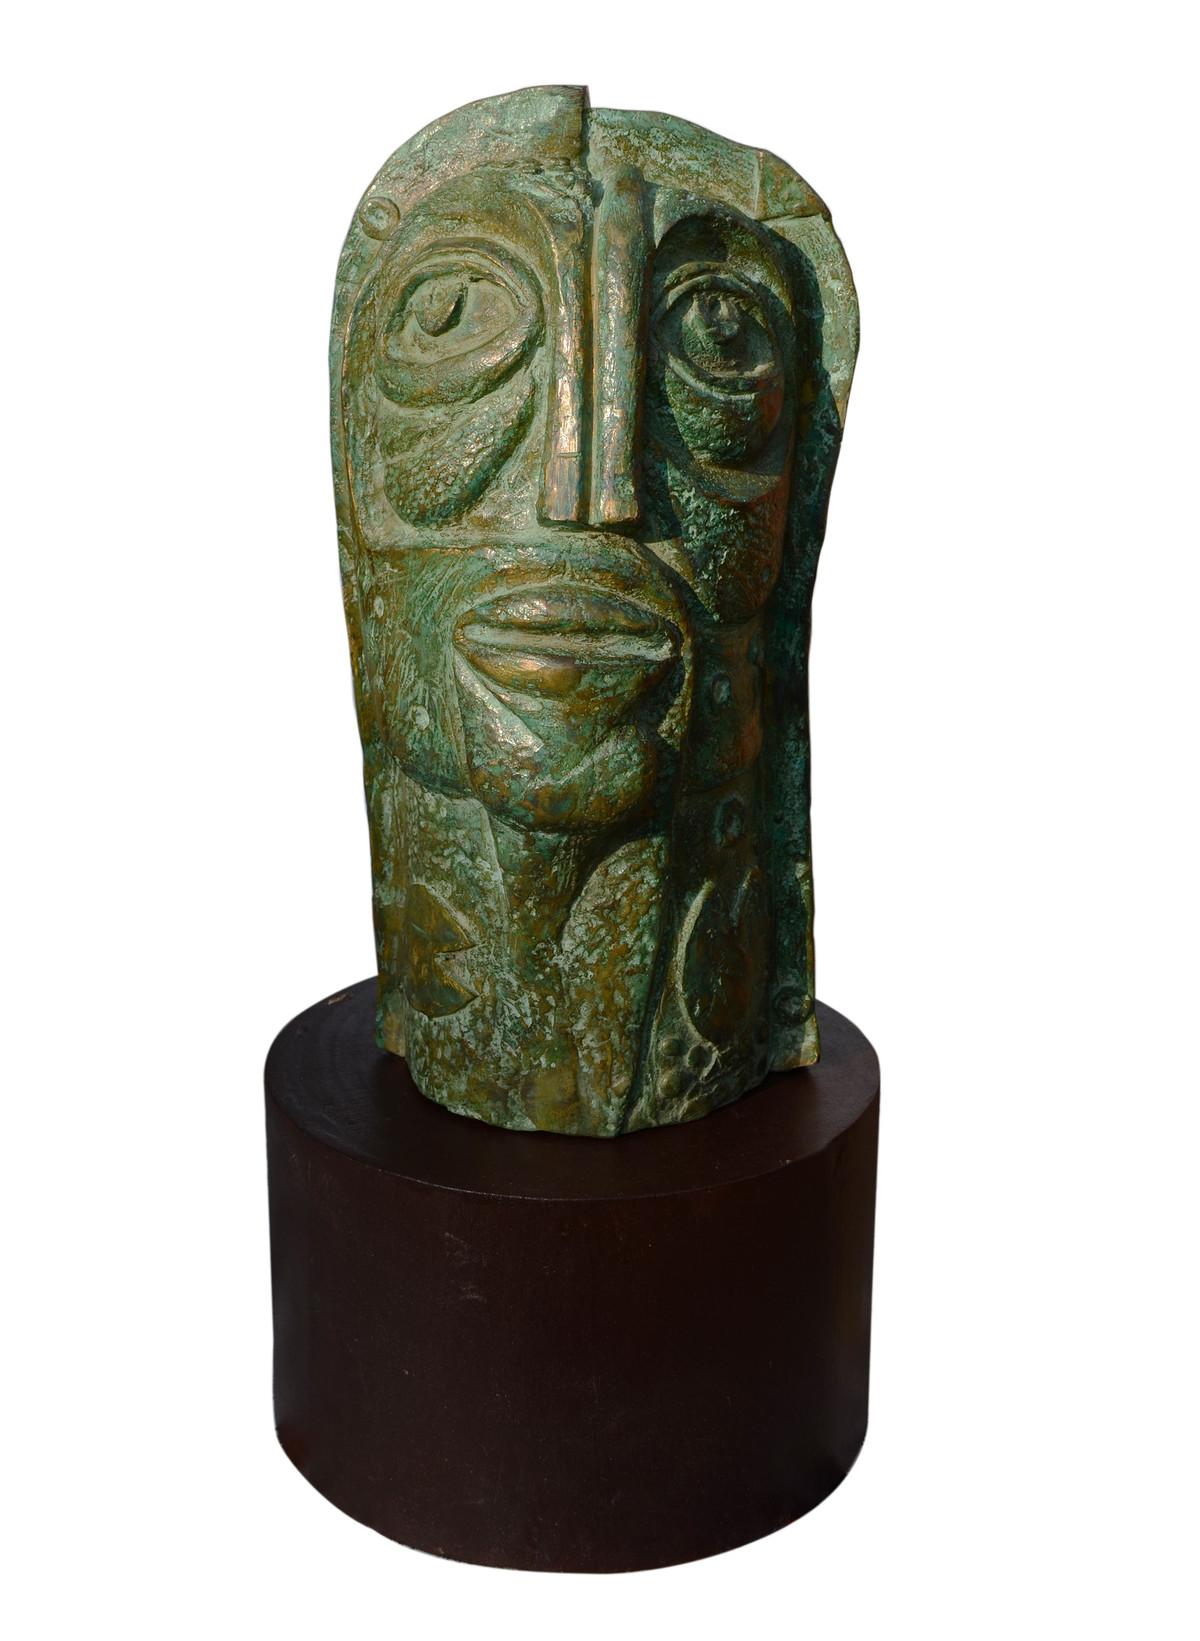 nature 02 by Atish Mukherjee, Art Deco Sculpture | 3D, Bronze, White color